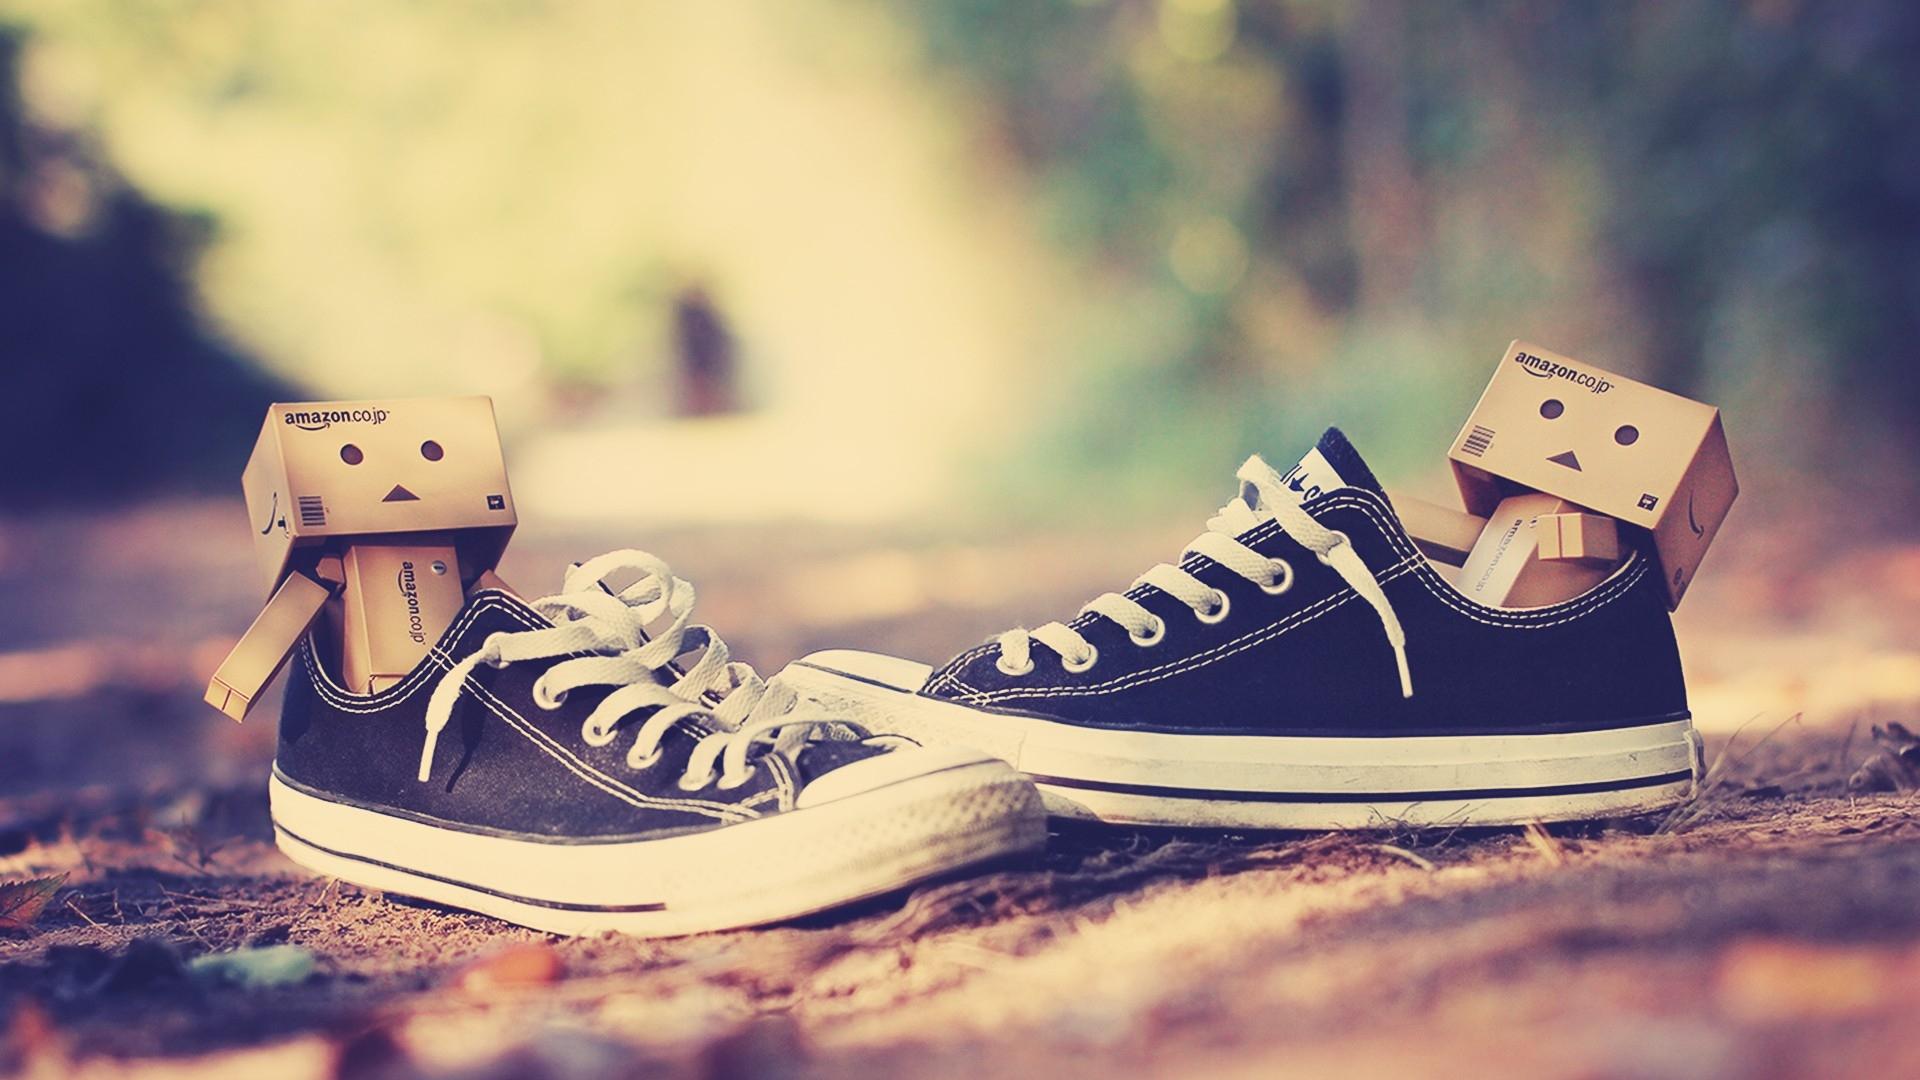 danboard-pair-sneakers-funny-fiction-1920x1080-wallpaper-wp3404429